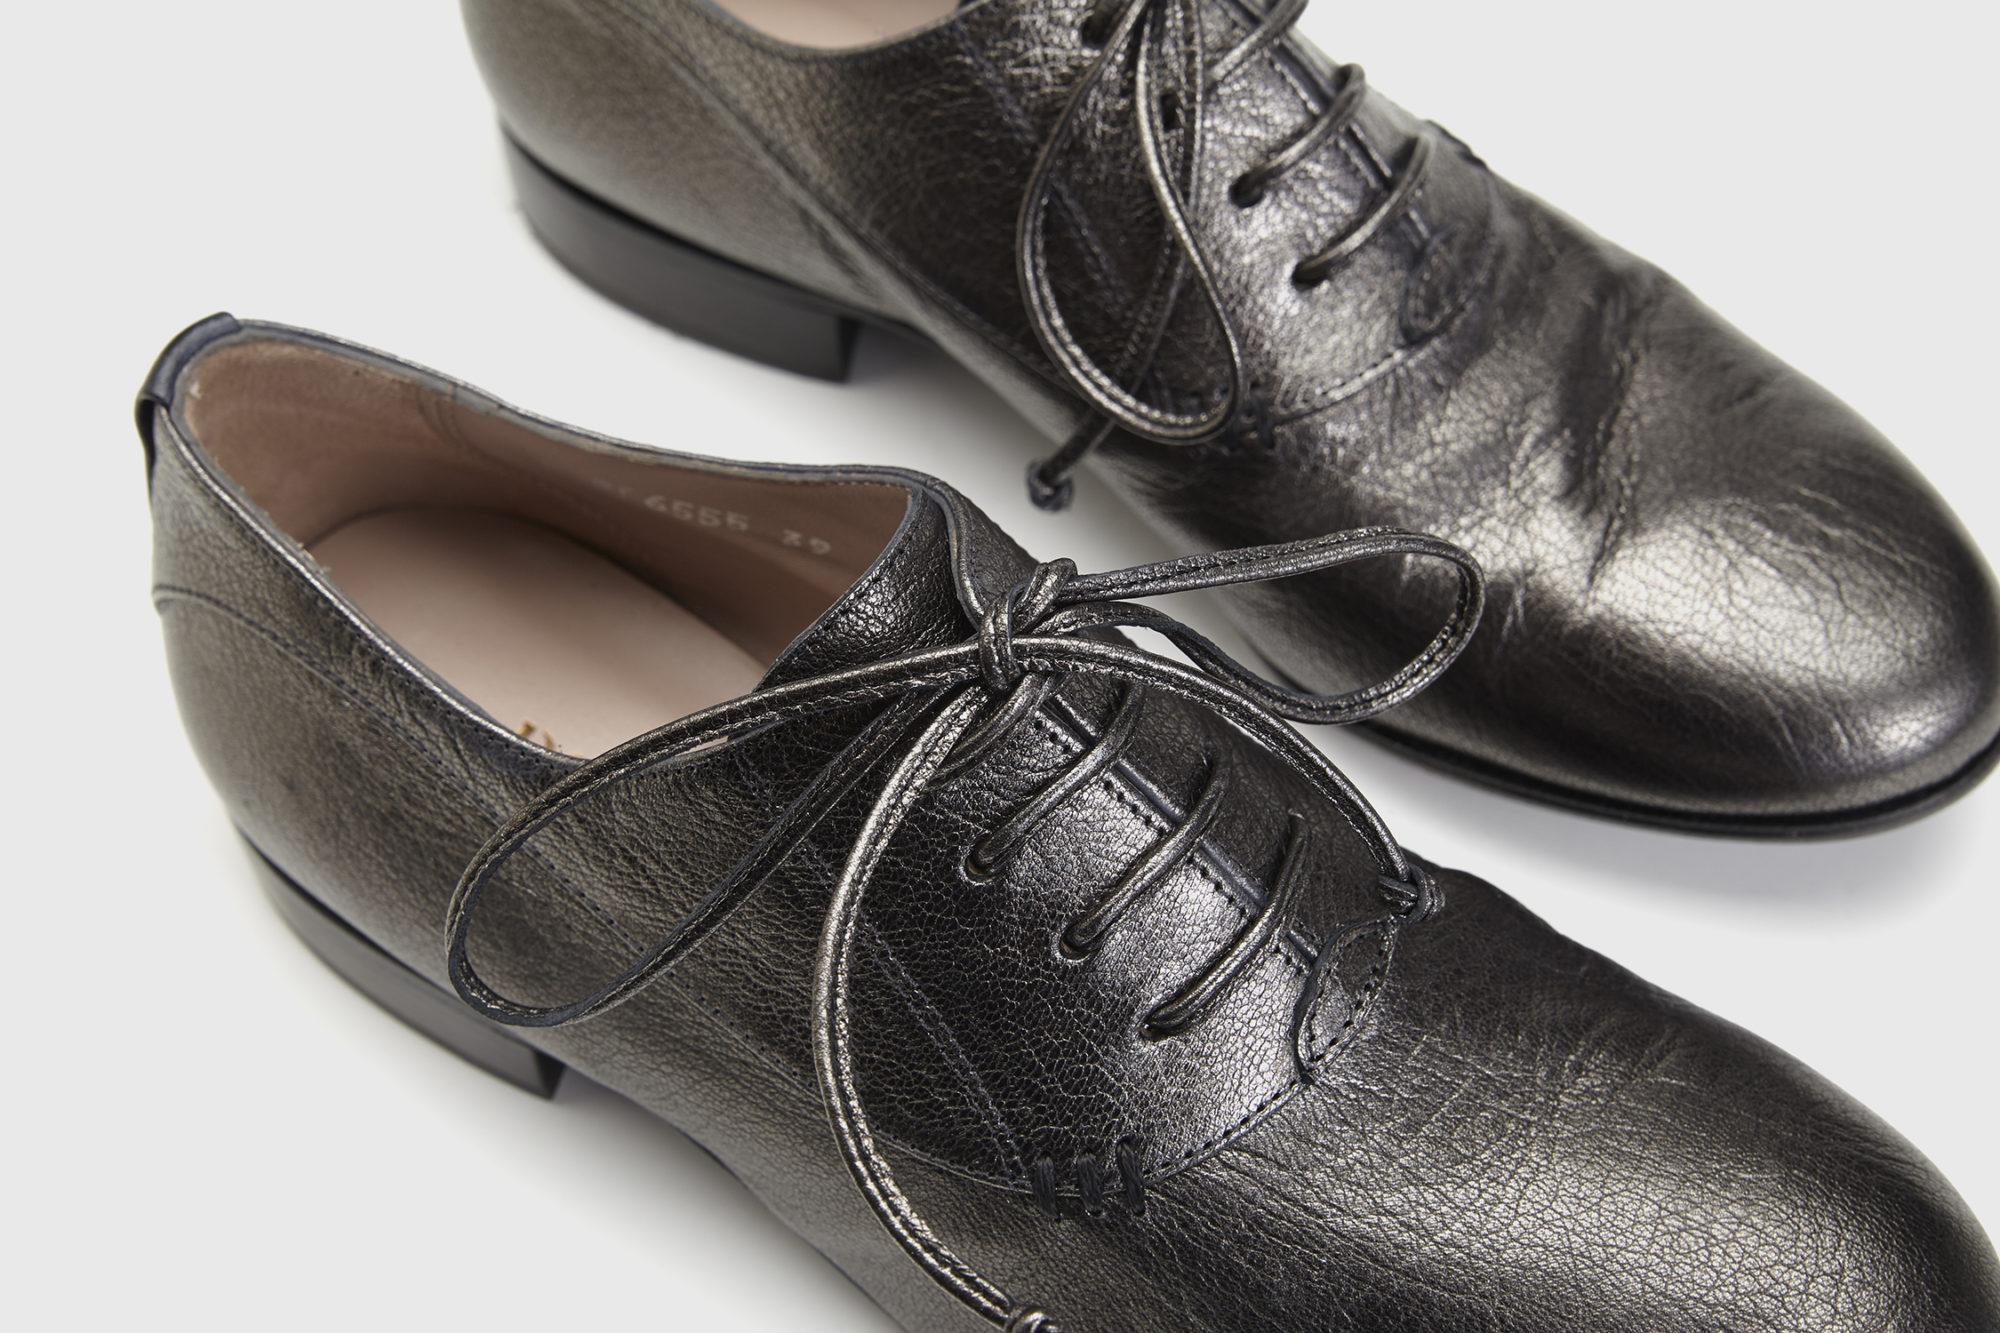 Dorotea zapato de cordones Florence antracite fw18 detalle